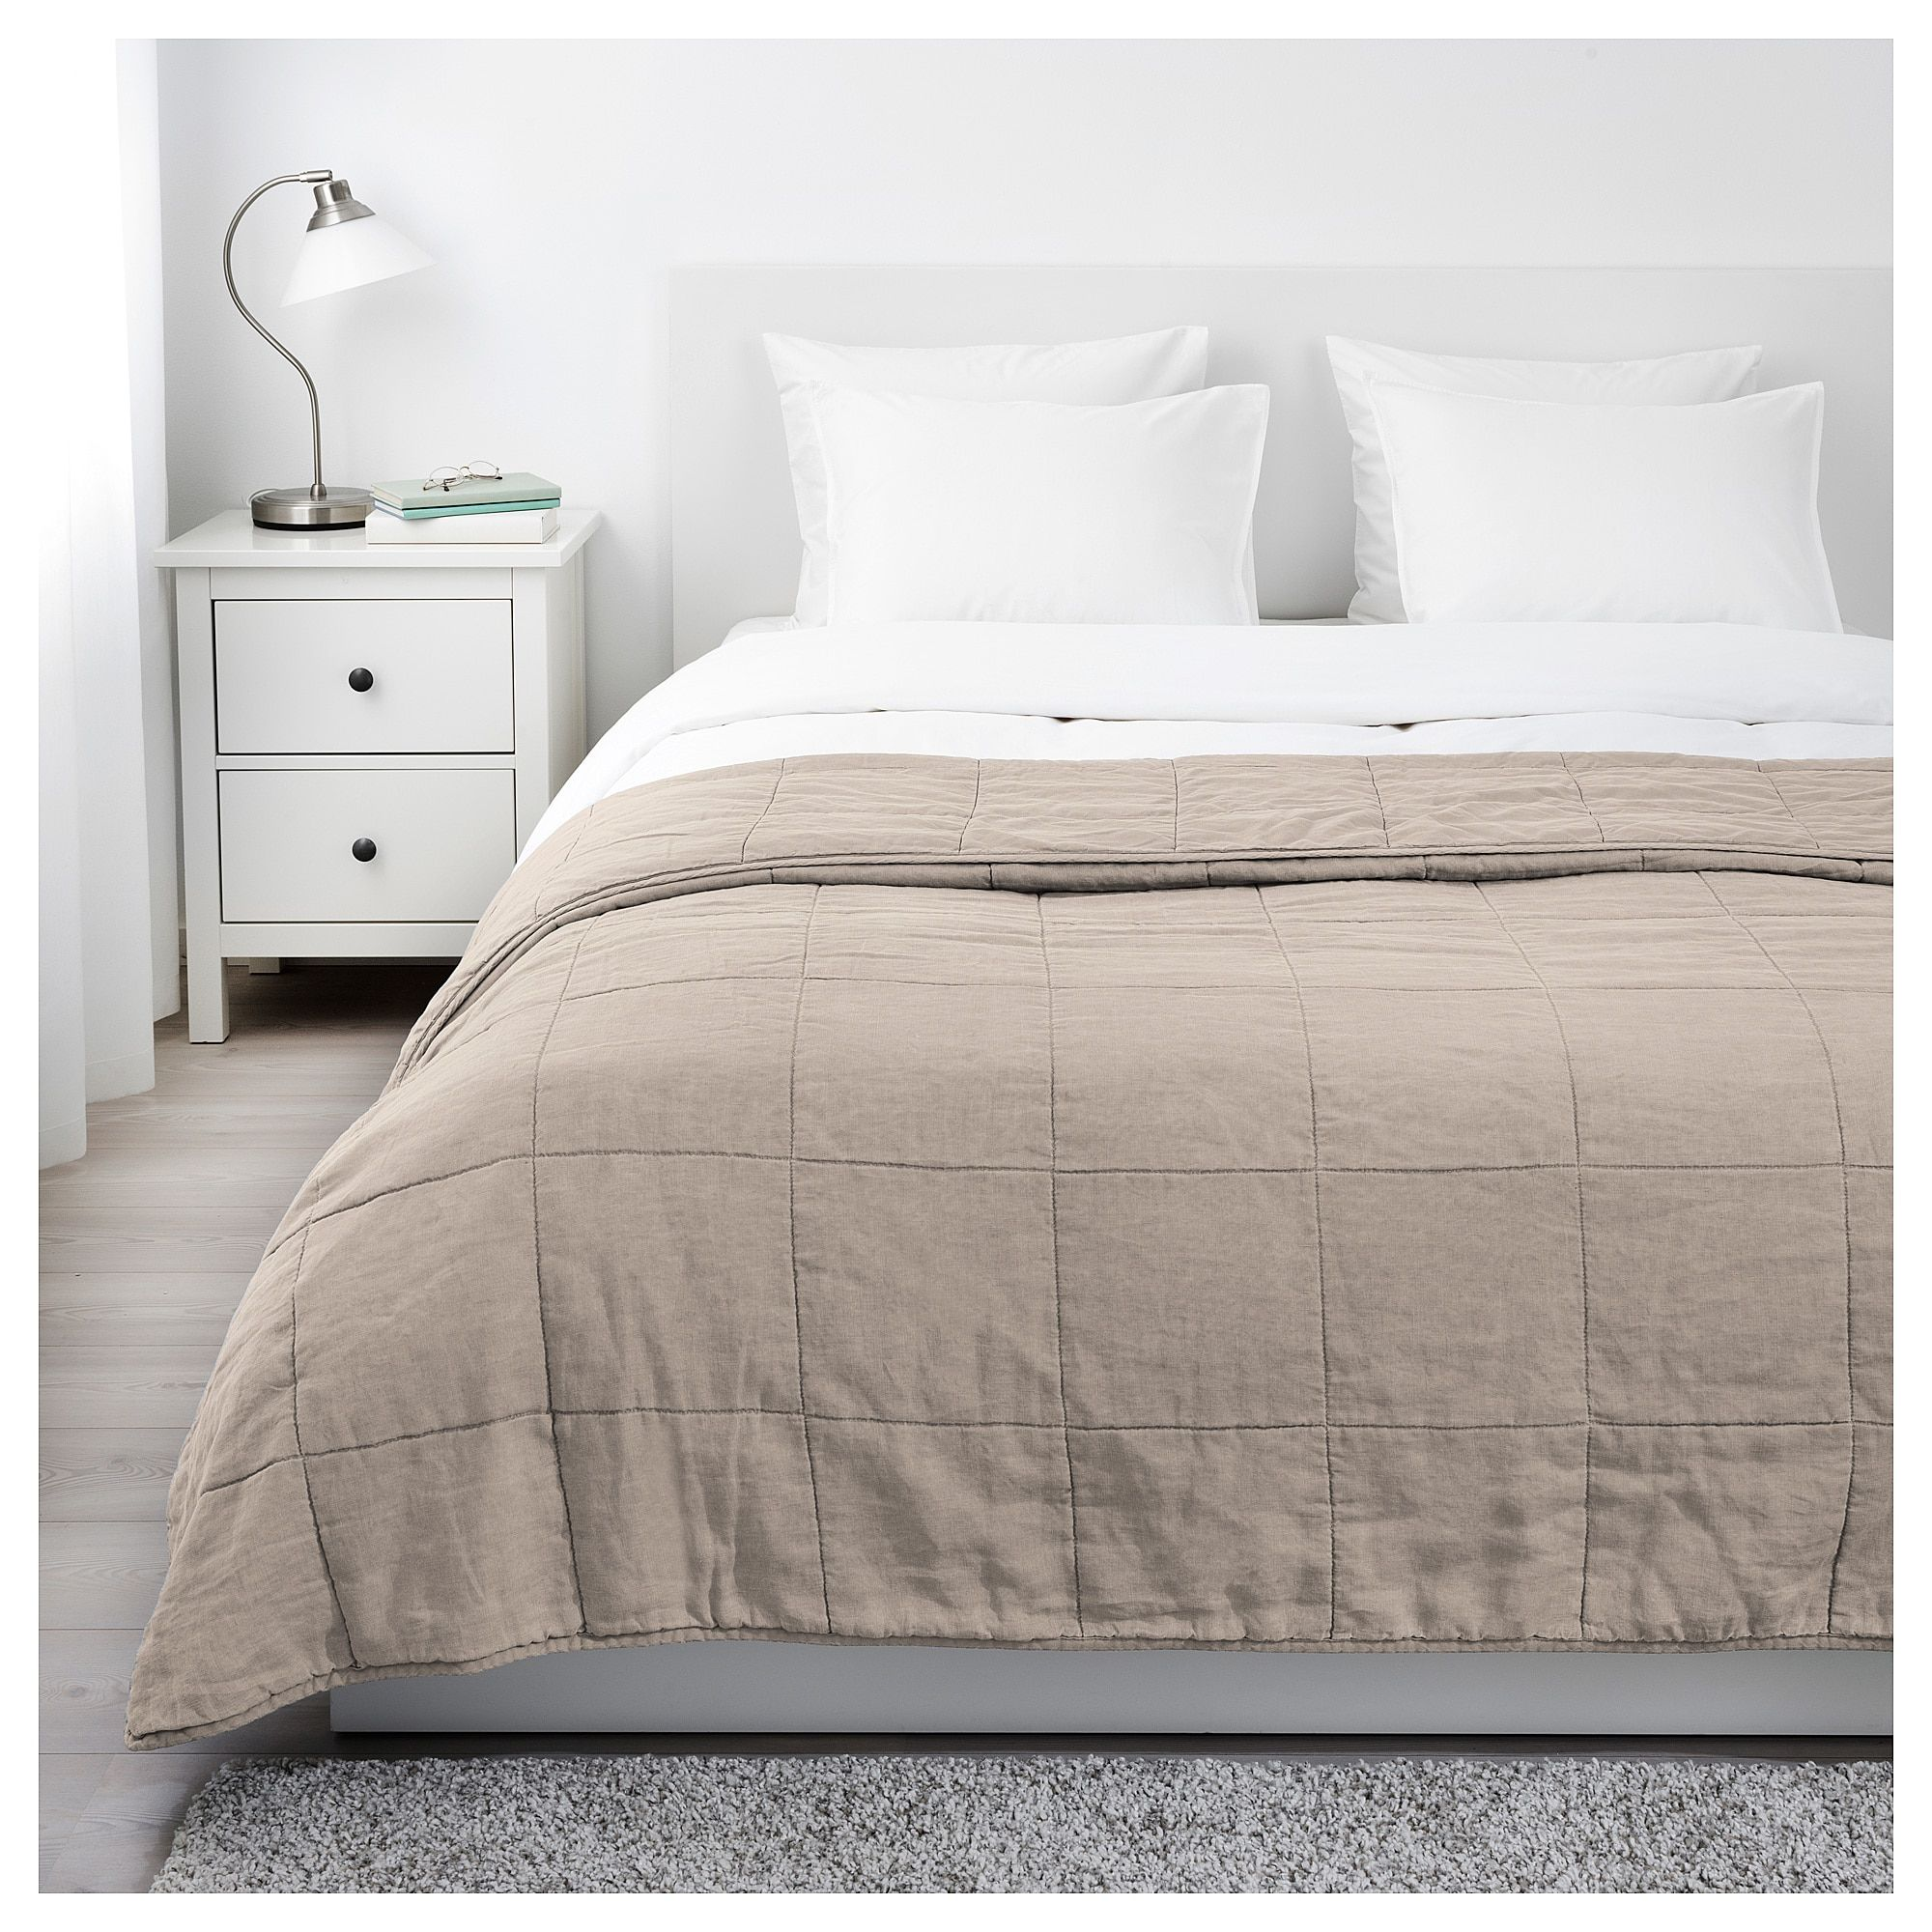 Ikea Gulved Bedspread Natural Tagesdecke Ikea Und Tagesdecke